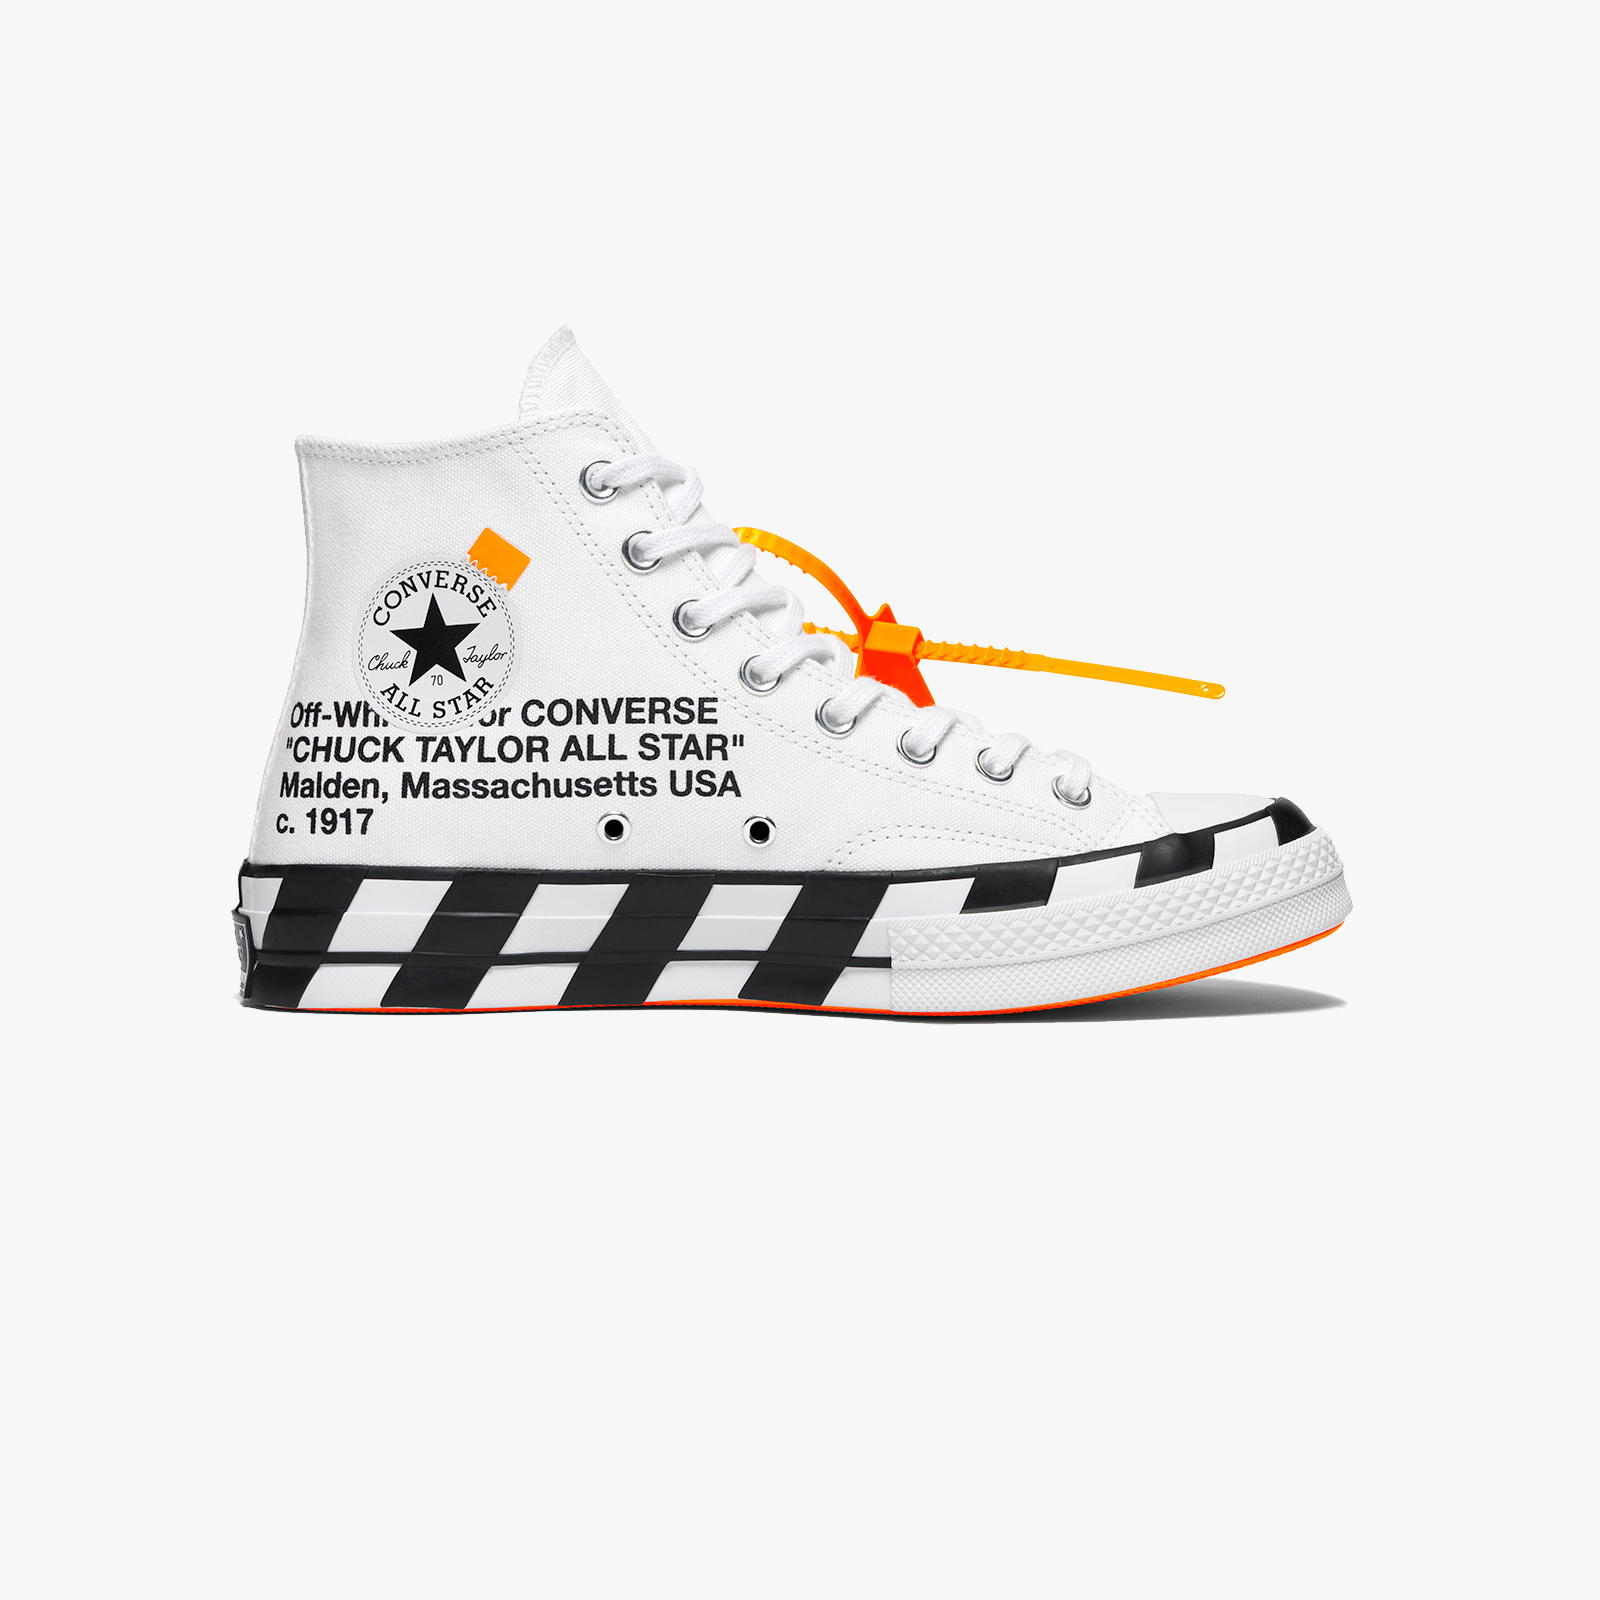 Converse Chuck Taylor 70 x Off White - 163862c - Sneakersnstuff ... 5e53c2d07